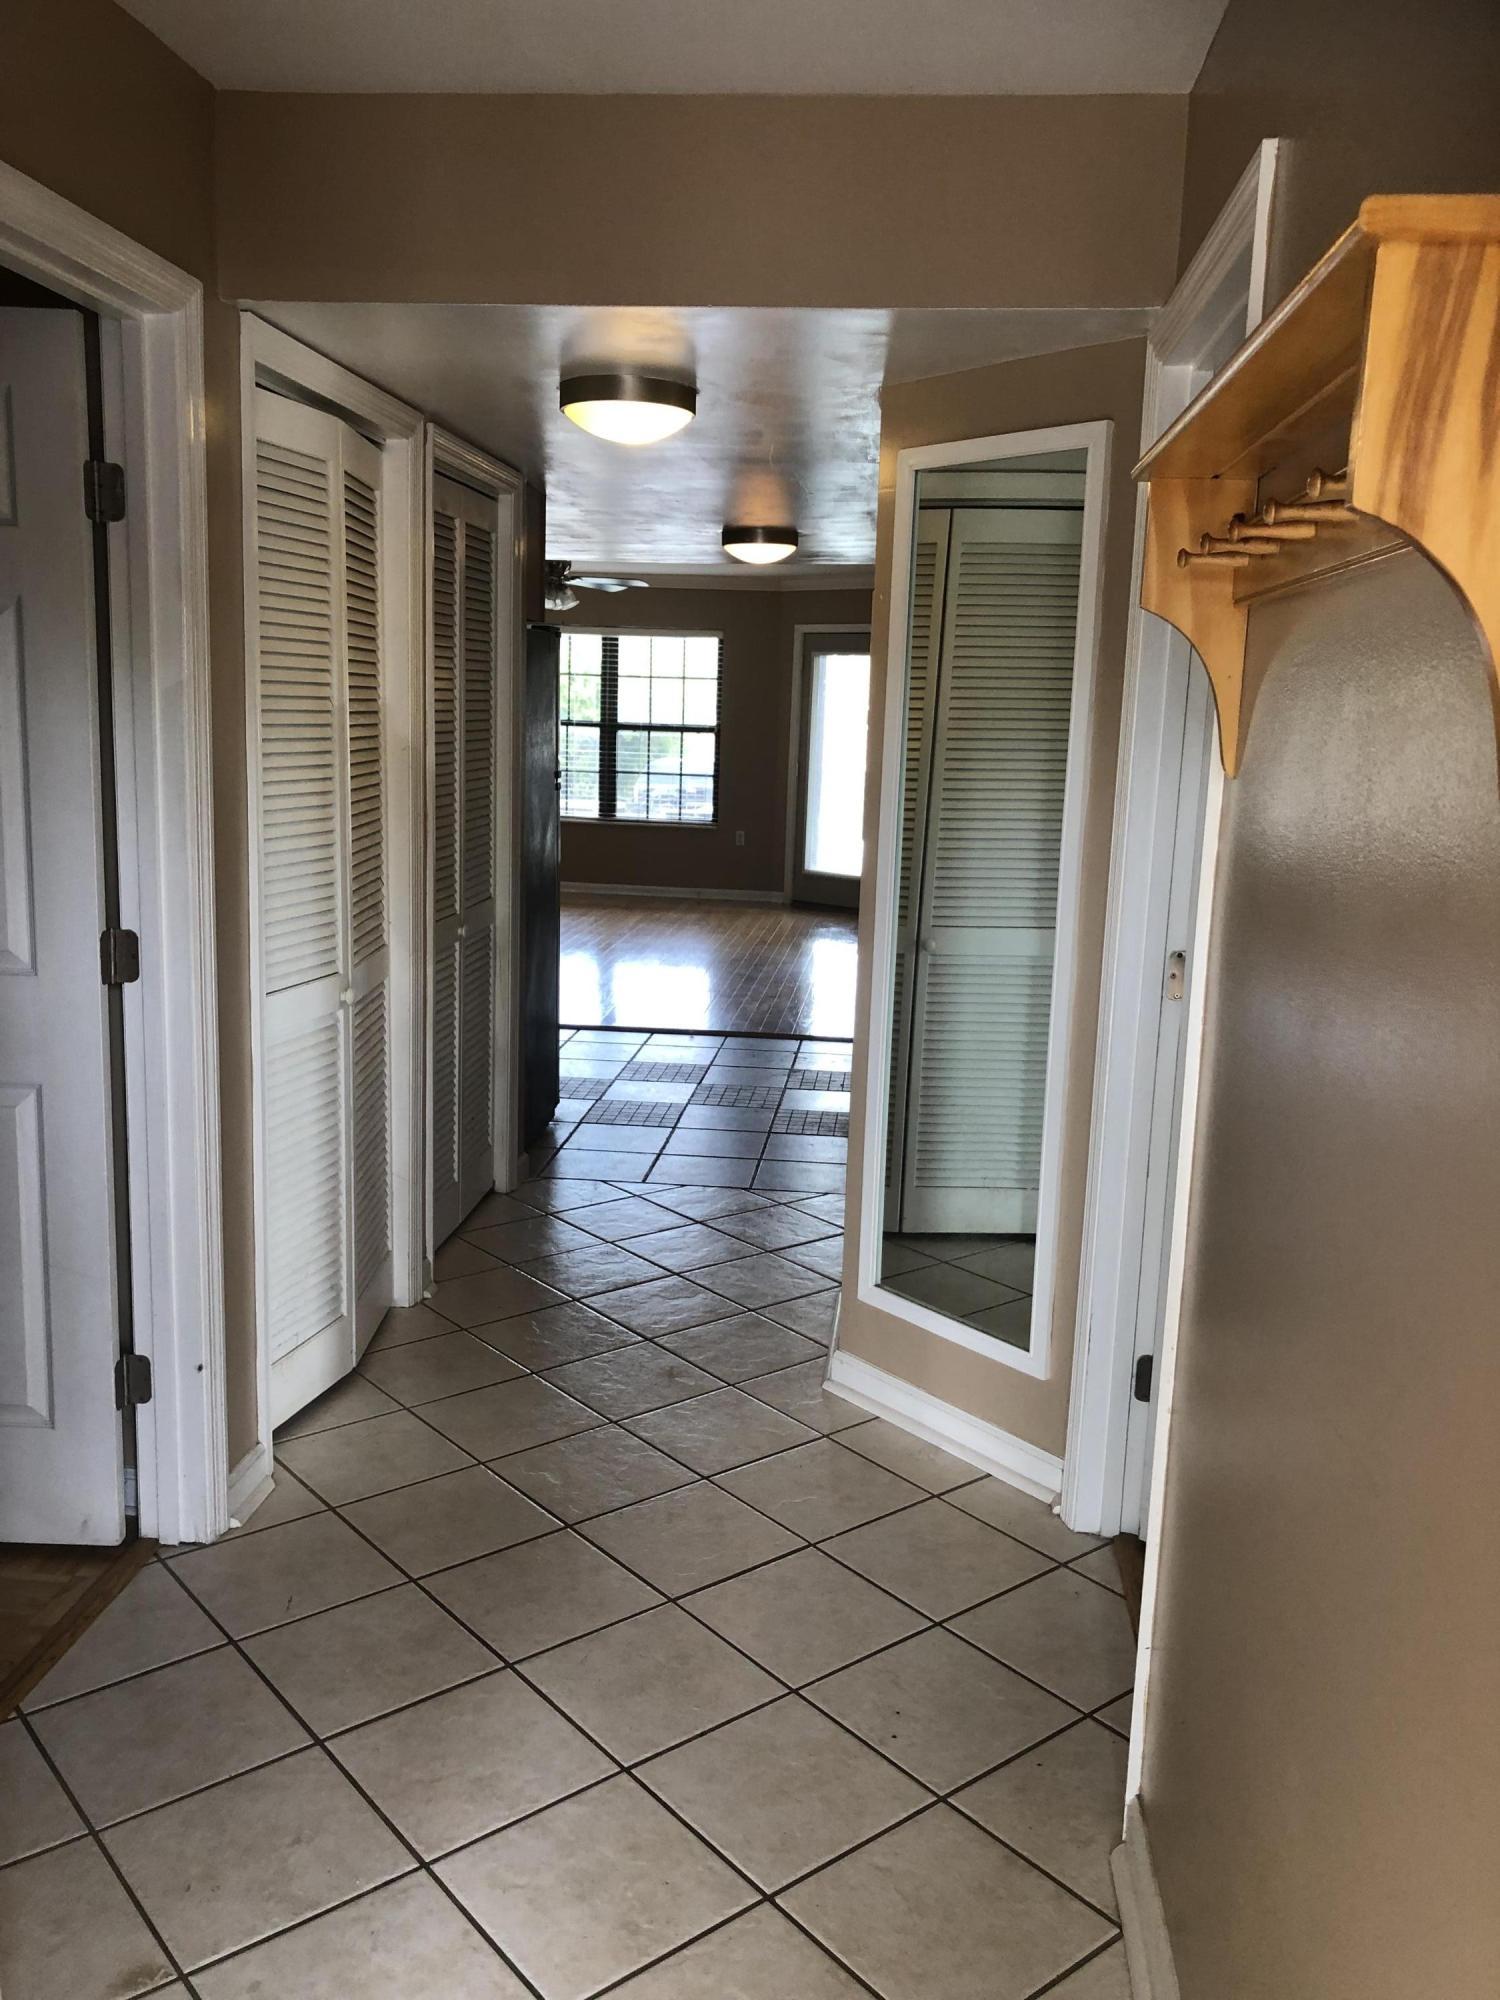 2201 Franklin Station Way, Knoxville, Tennessee 37916, 3 Bedrooms Bedrooms, ,2 BathroomsBathrooms,Rental,For Sale,Franklin Station,1088573